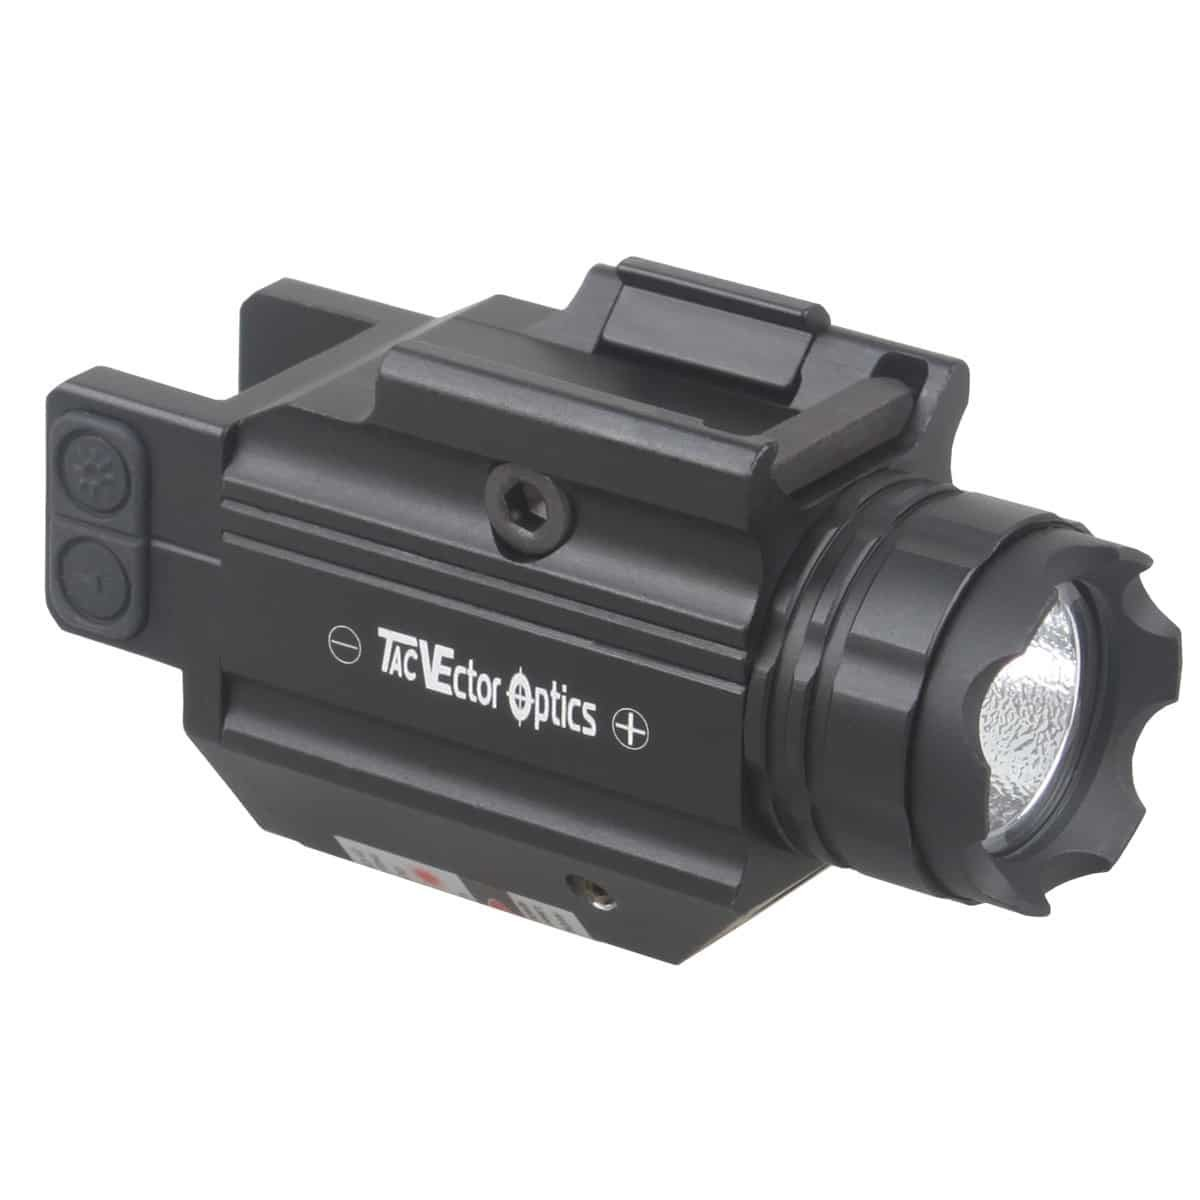 Lanterna de trilho Doublecross Compact com mira laser